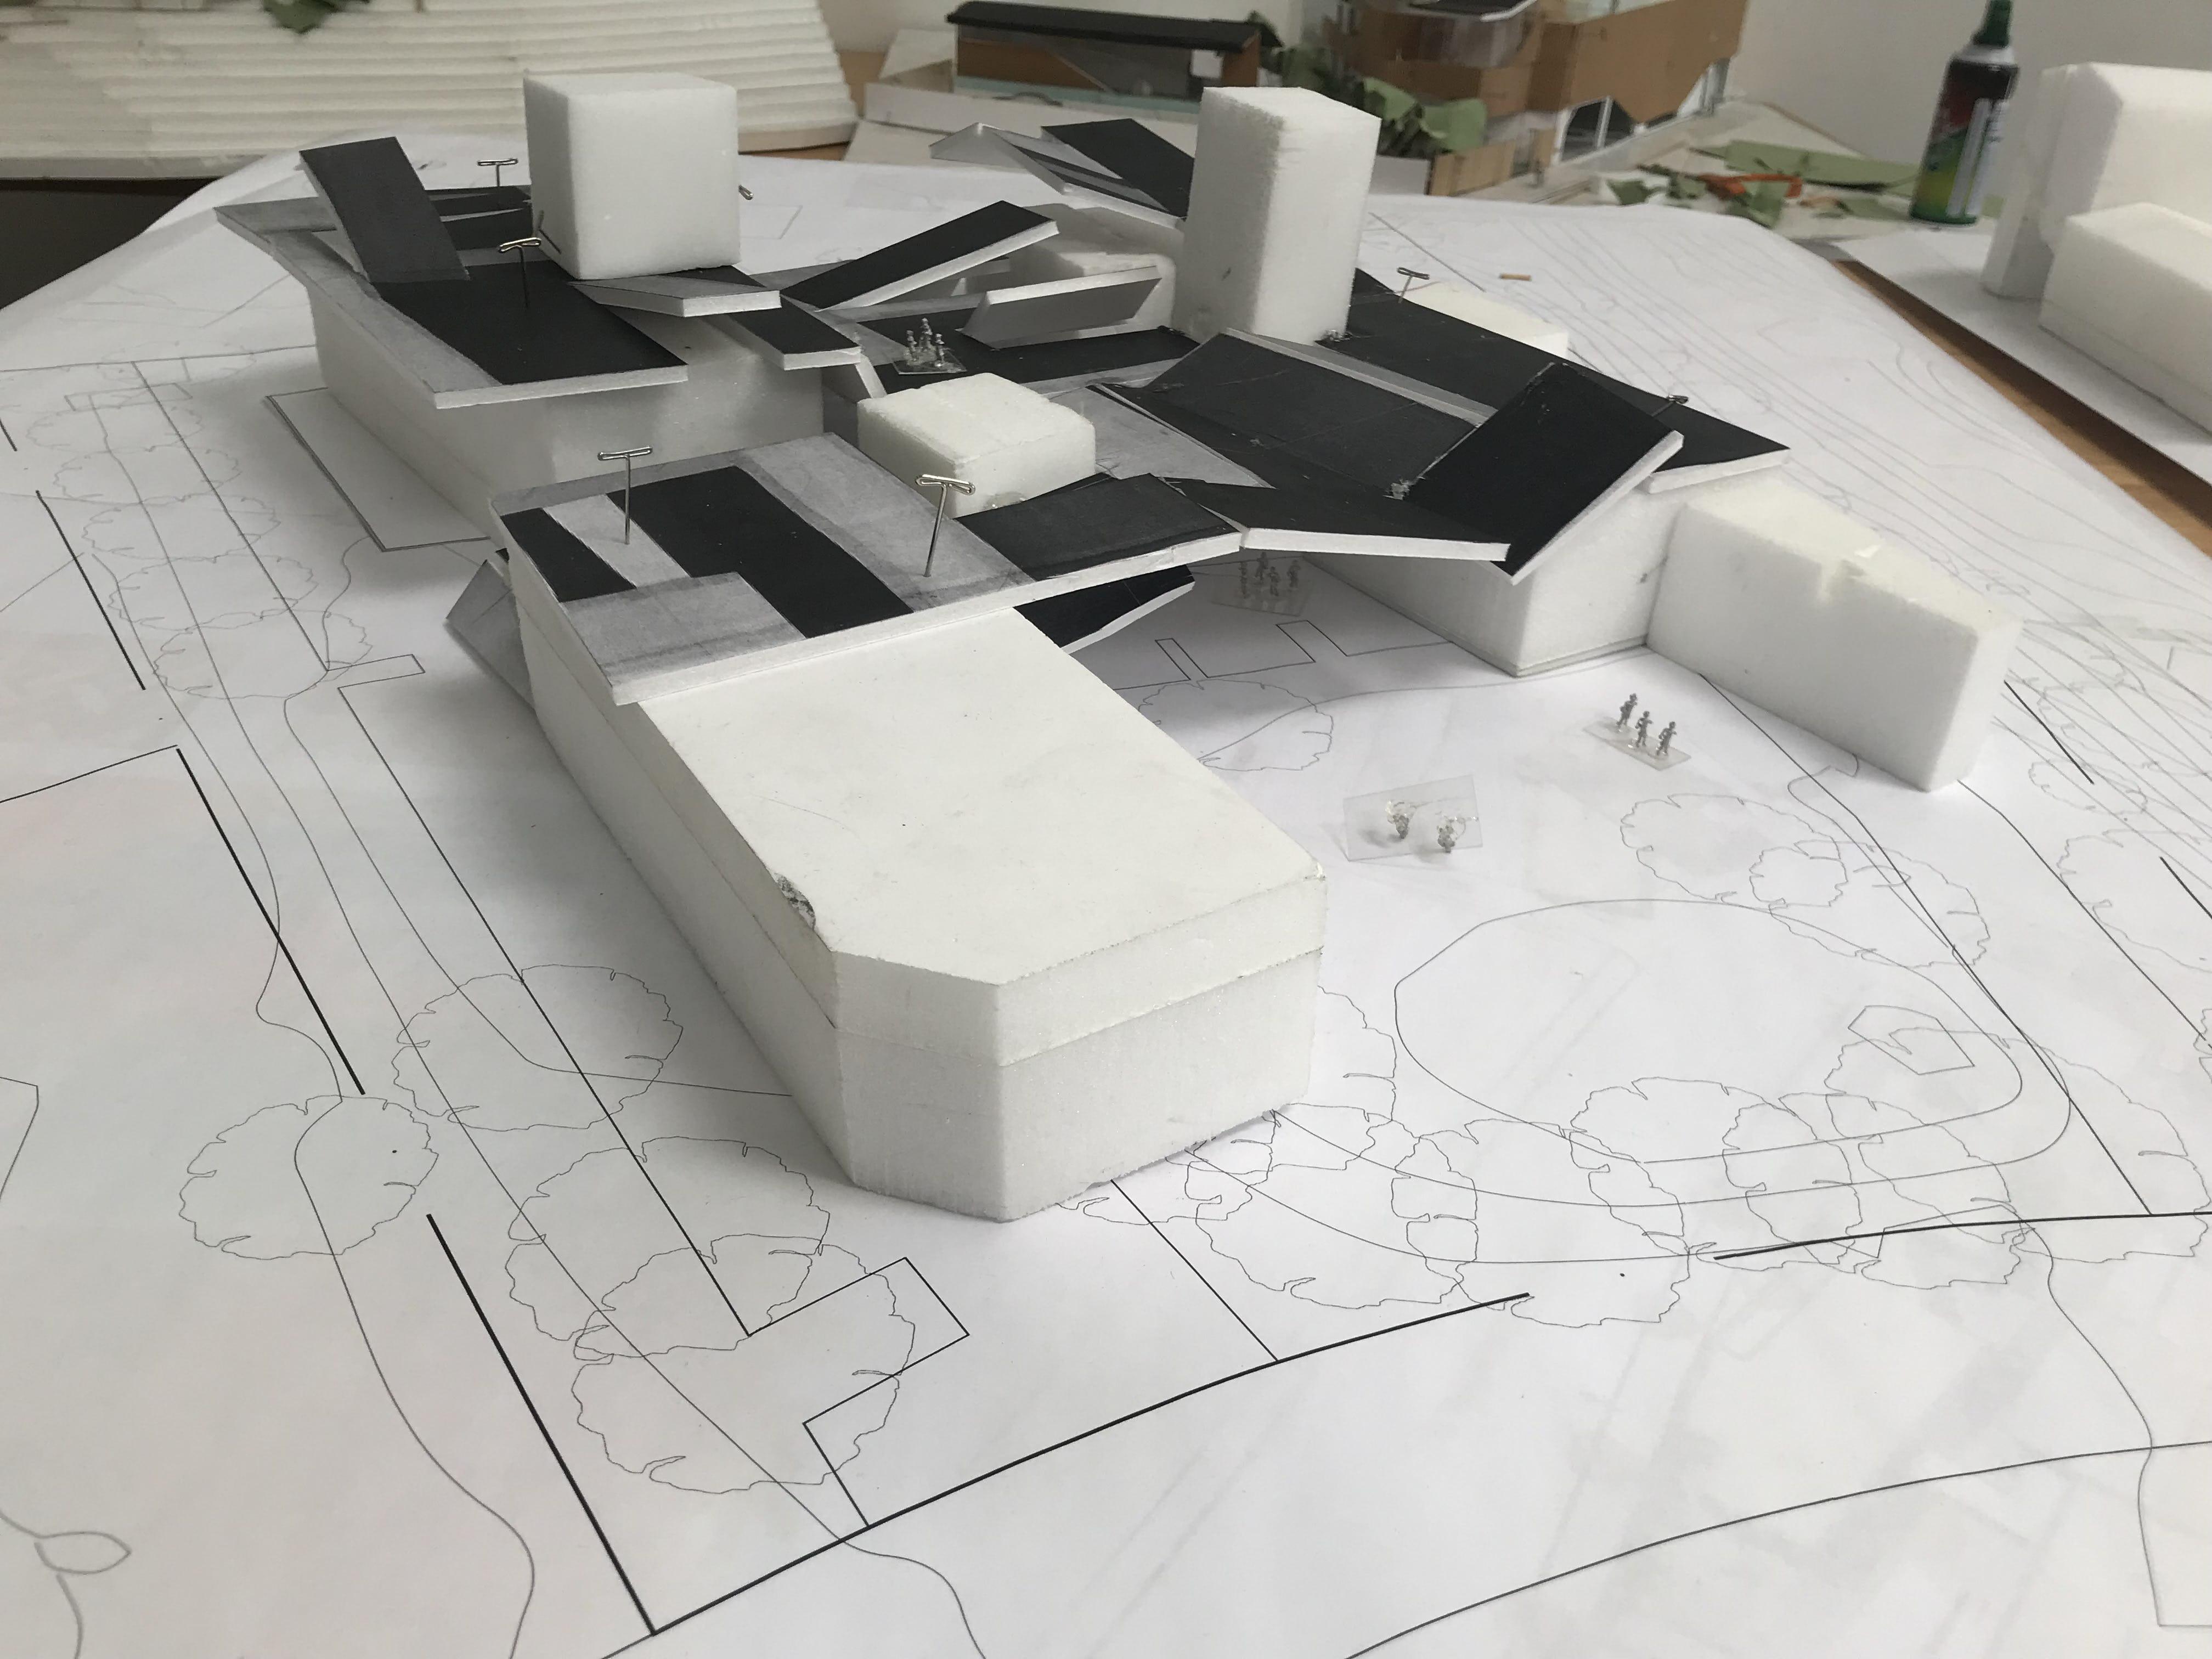 Concept model 1